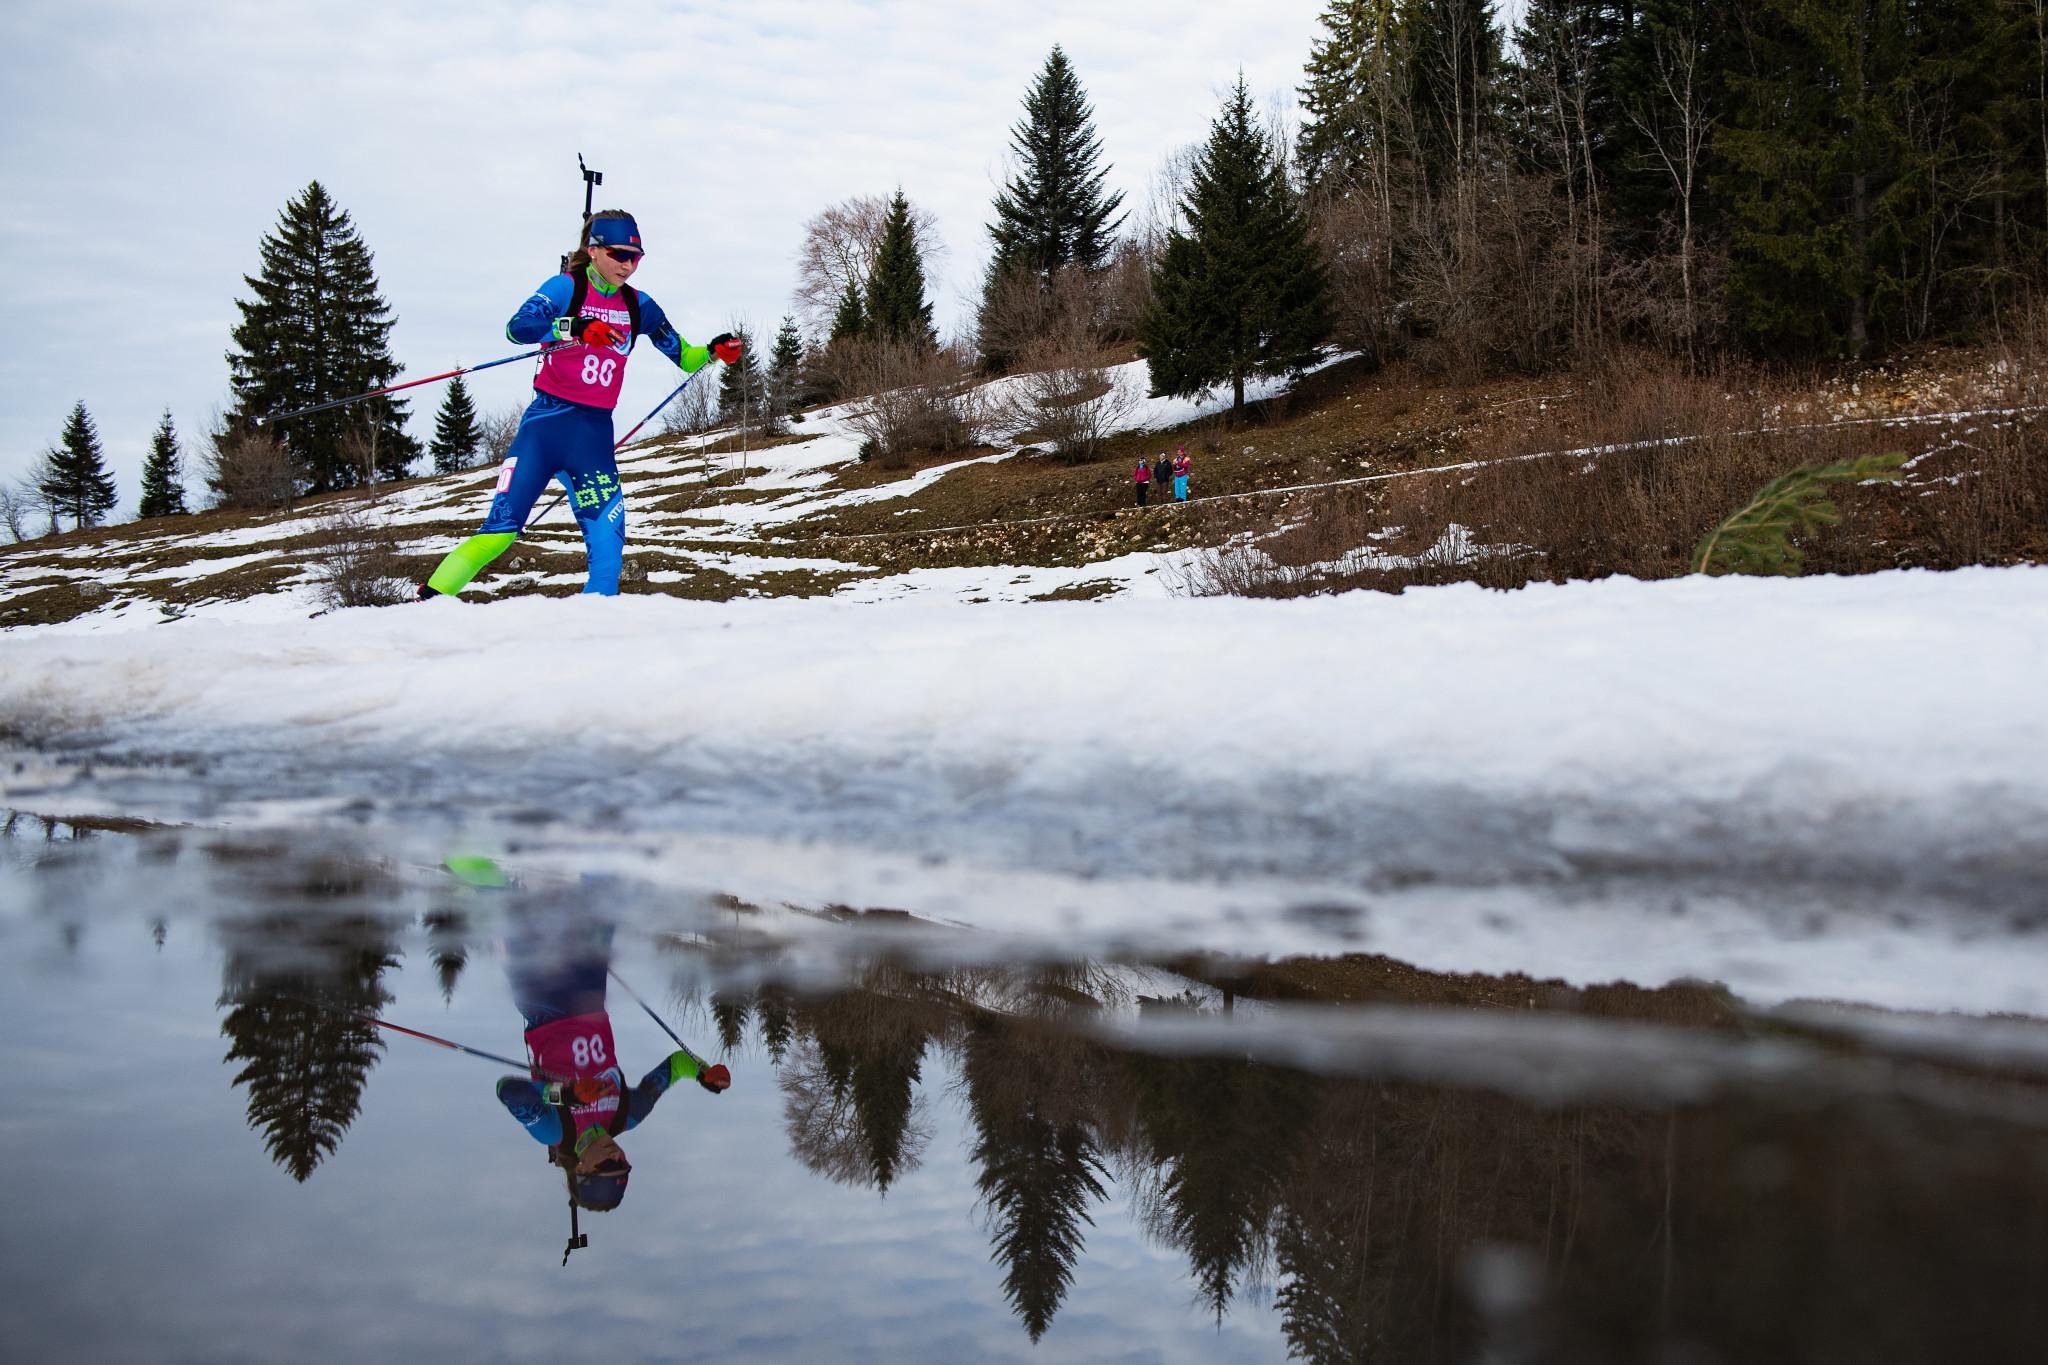 Speed key as biathlon sprint and ski slalom titles won at Lausanne 2020